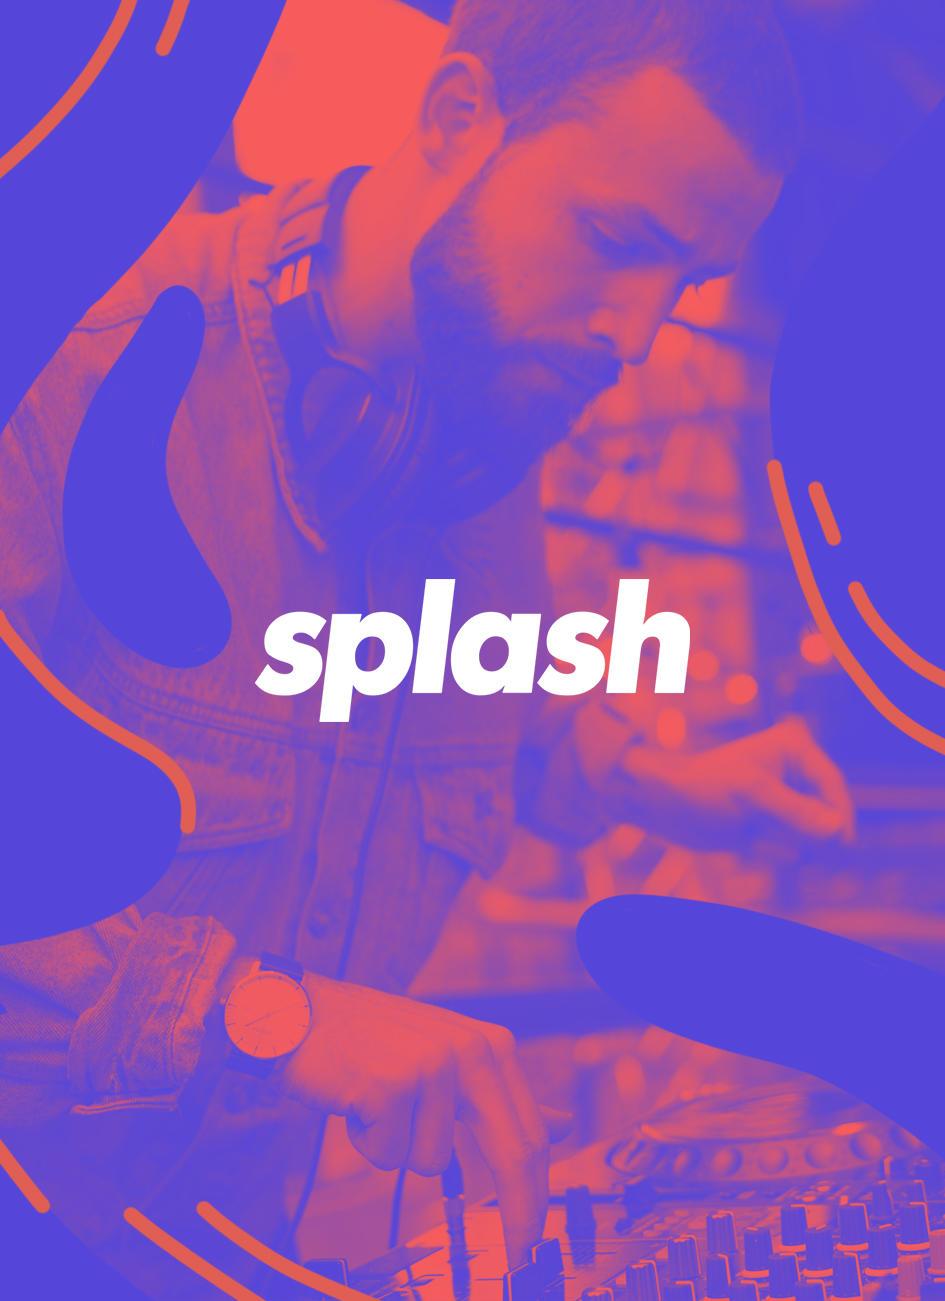 Event Marketing Software - Splash